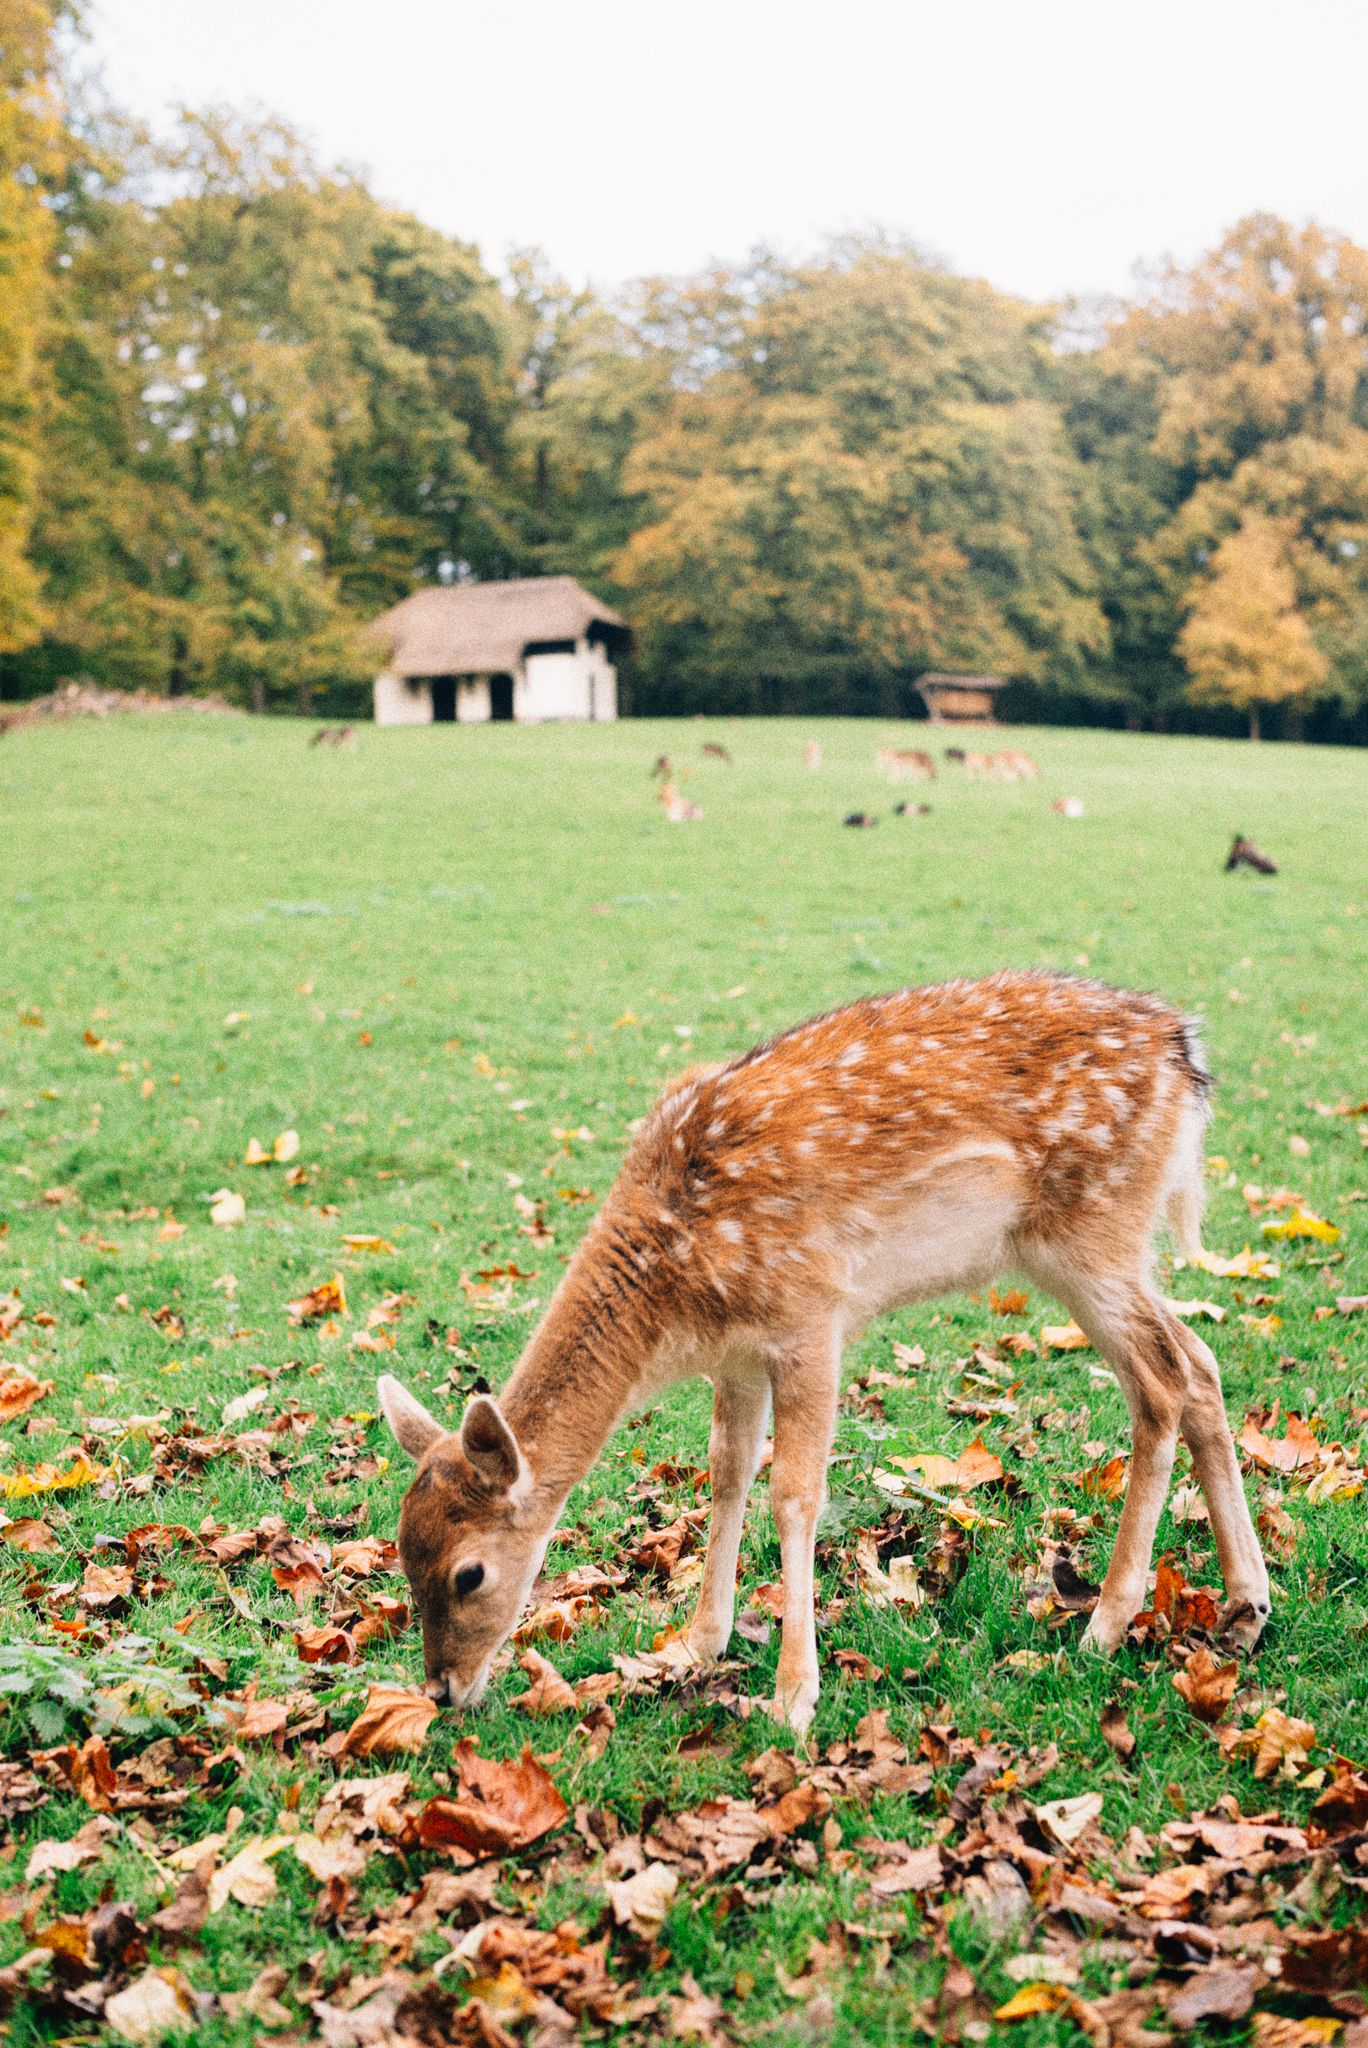 netherlands_sonsbeek_arnhem_deer_hert_park_leica_m240_50mm_summilux_autumn